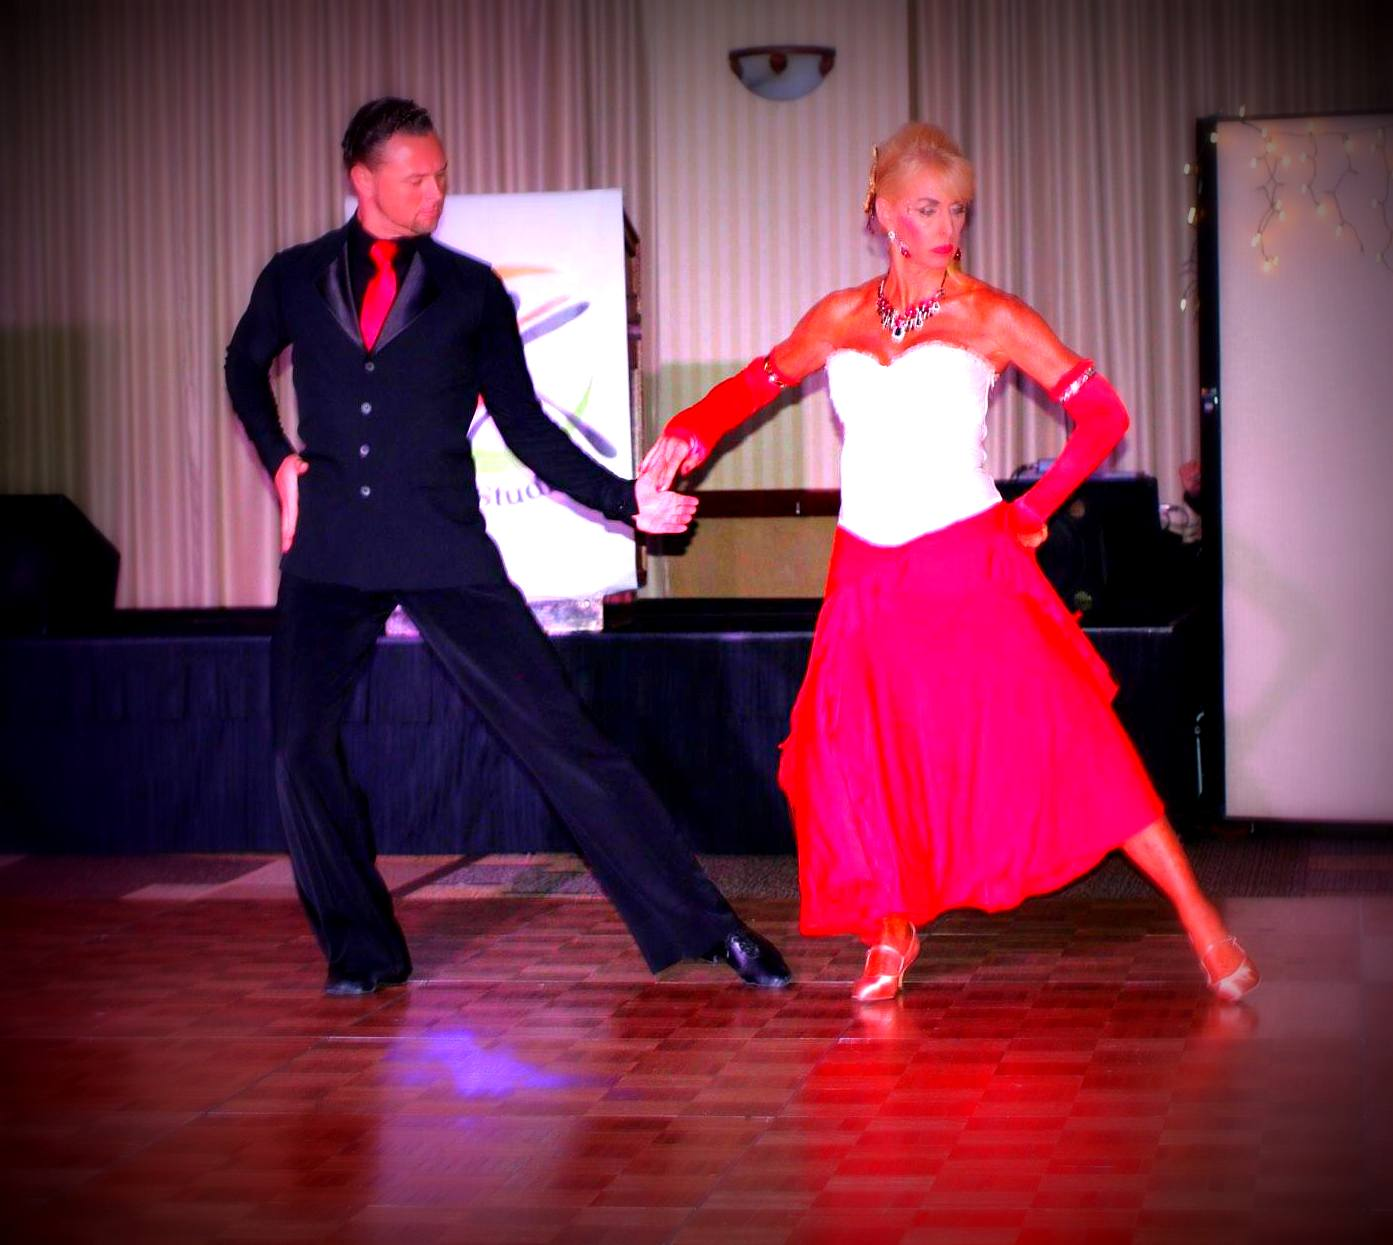 ballroom dance lessons classes in